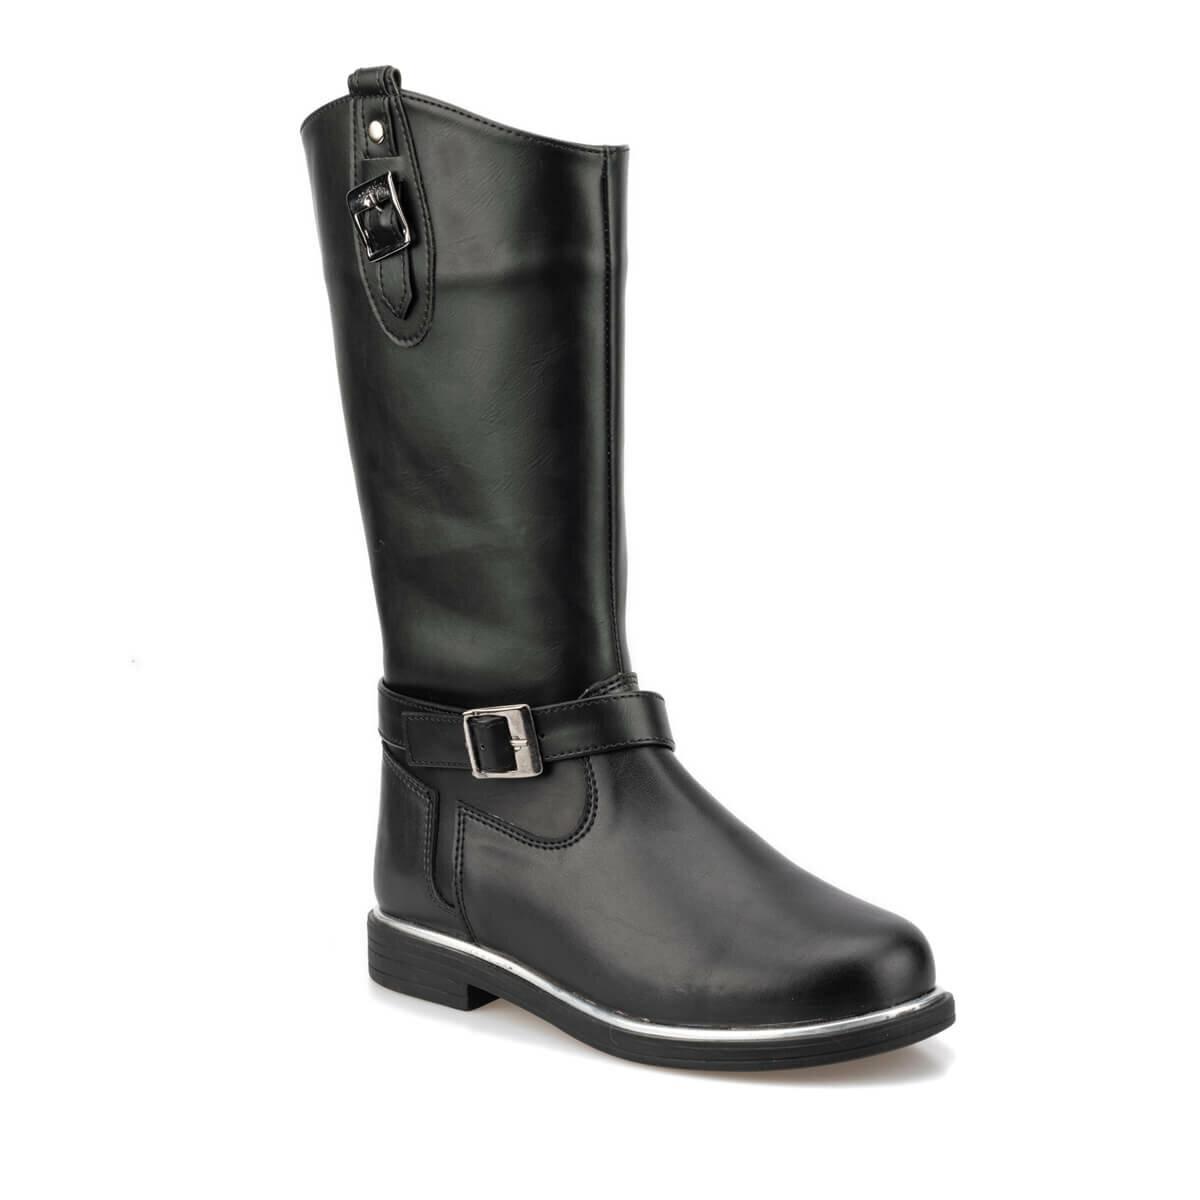 FLO 92.511825.F Black Female Child Boots Polaris